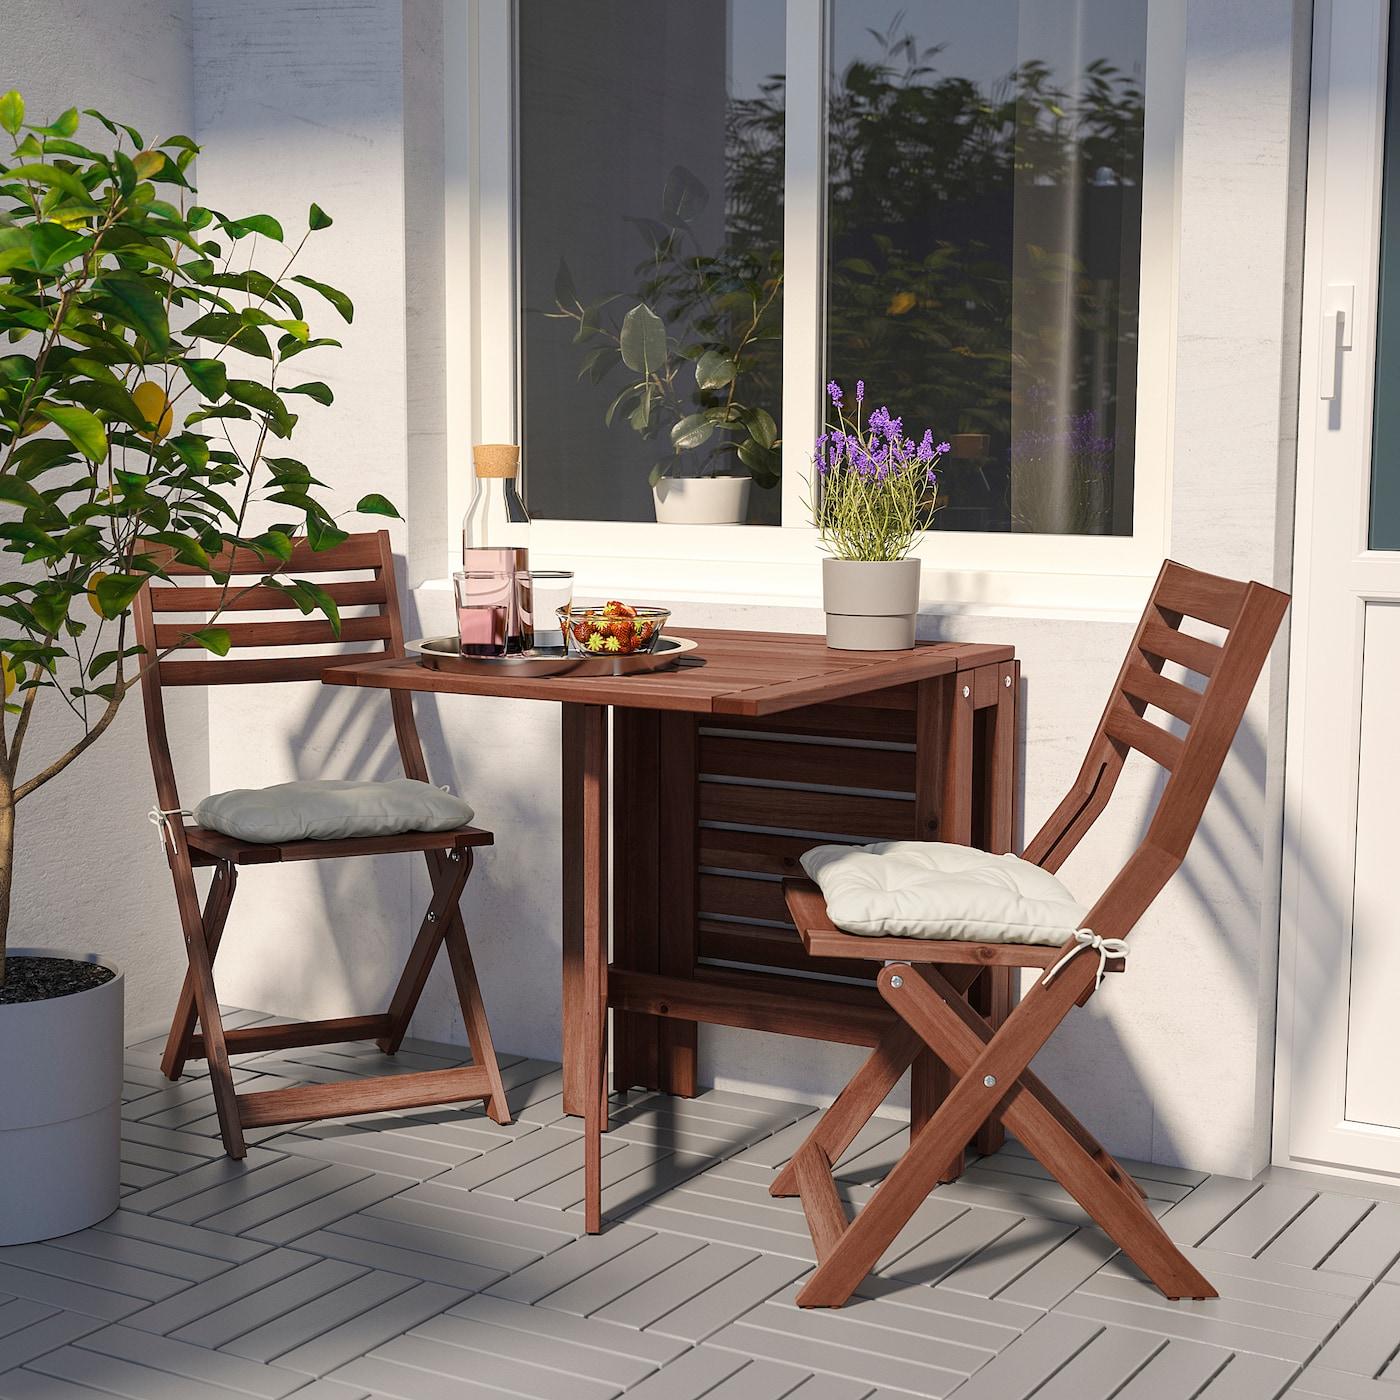 Tavolino Per Balcone Ikea ÄpplarÖ gateleg table, outdoor - brown stained 20/77/133x62 cm